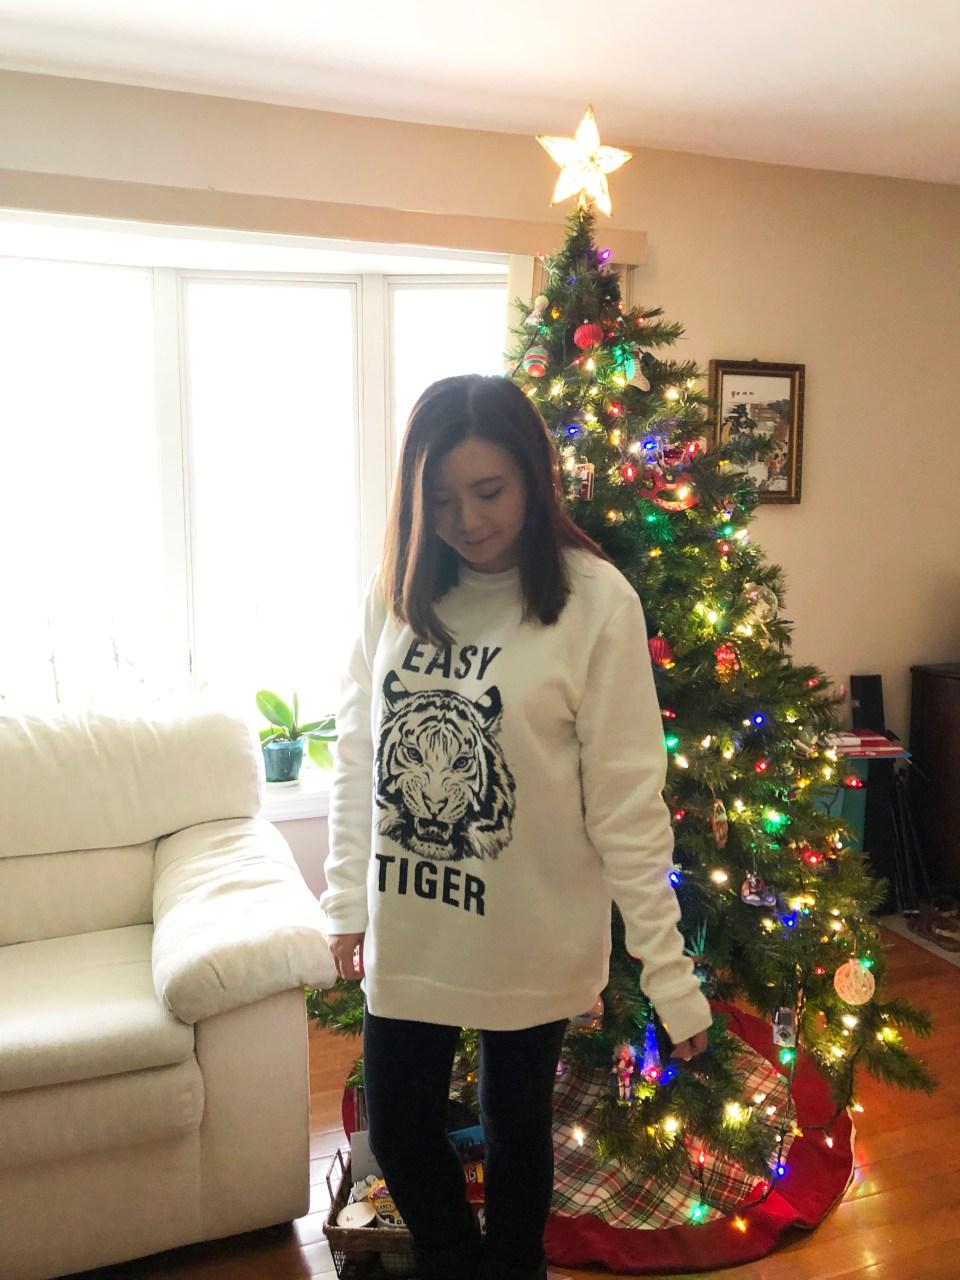 Easy Tiger Sweatshirt 3